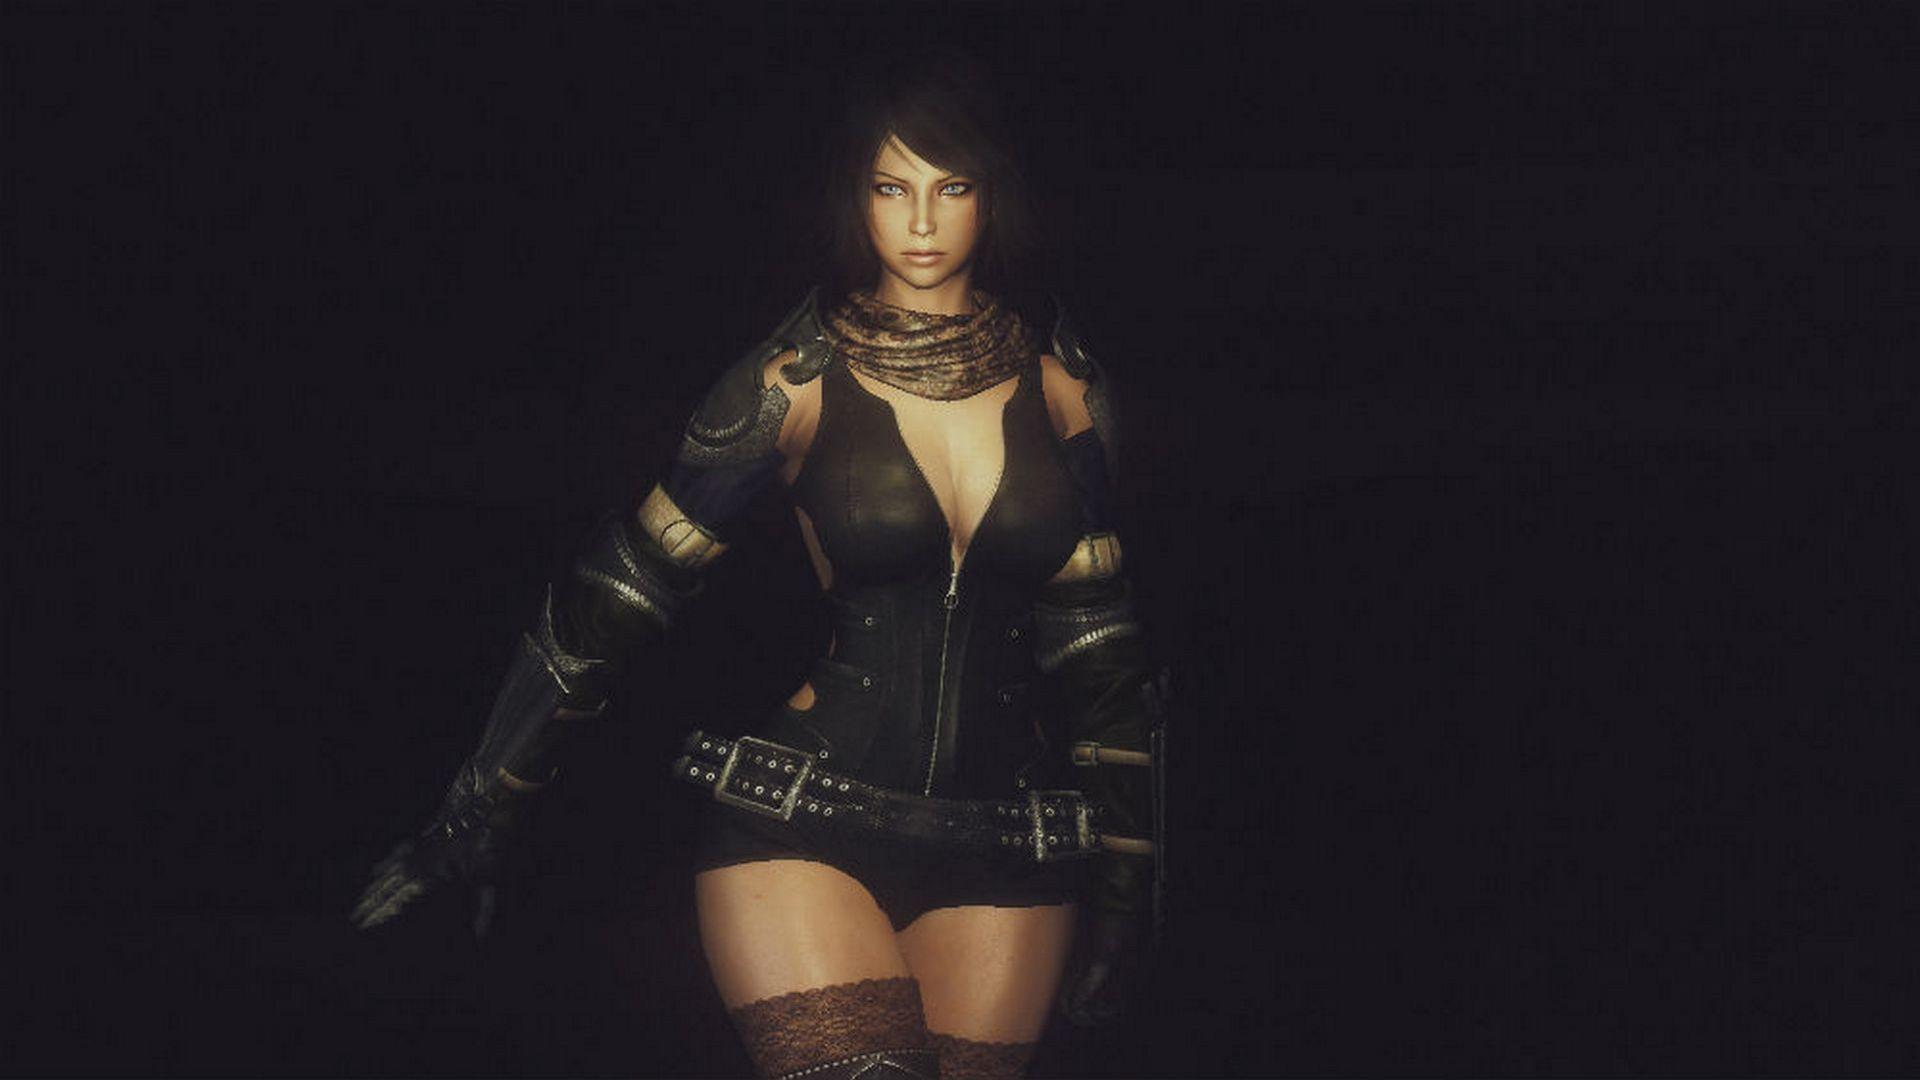 Blacktalon_armor_05.jpg